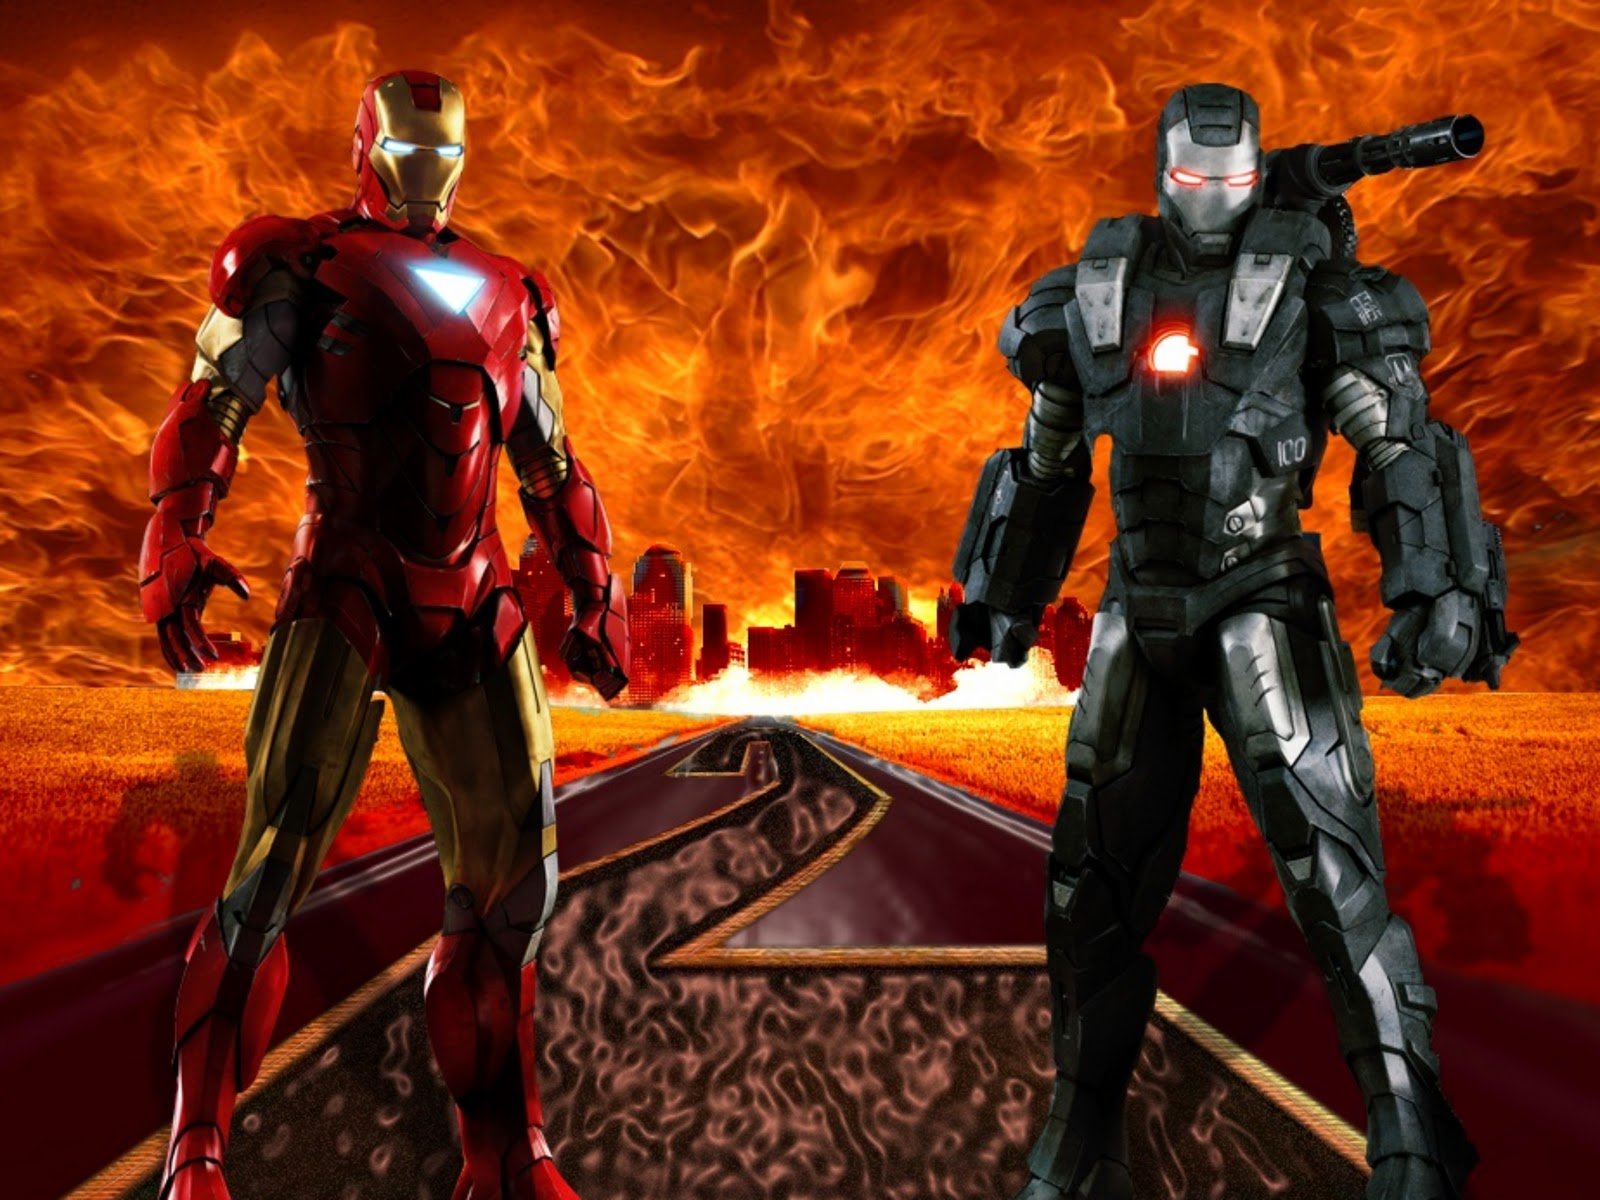 Iron Man 2: Iron Man Wallpapers High Quality